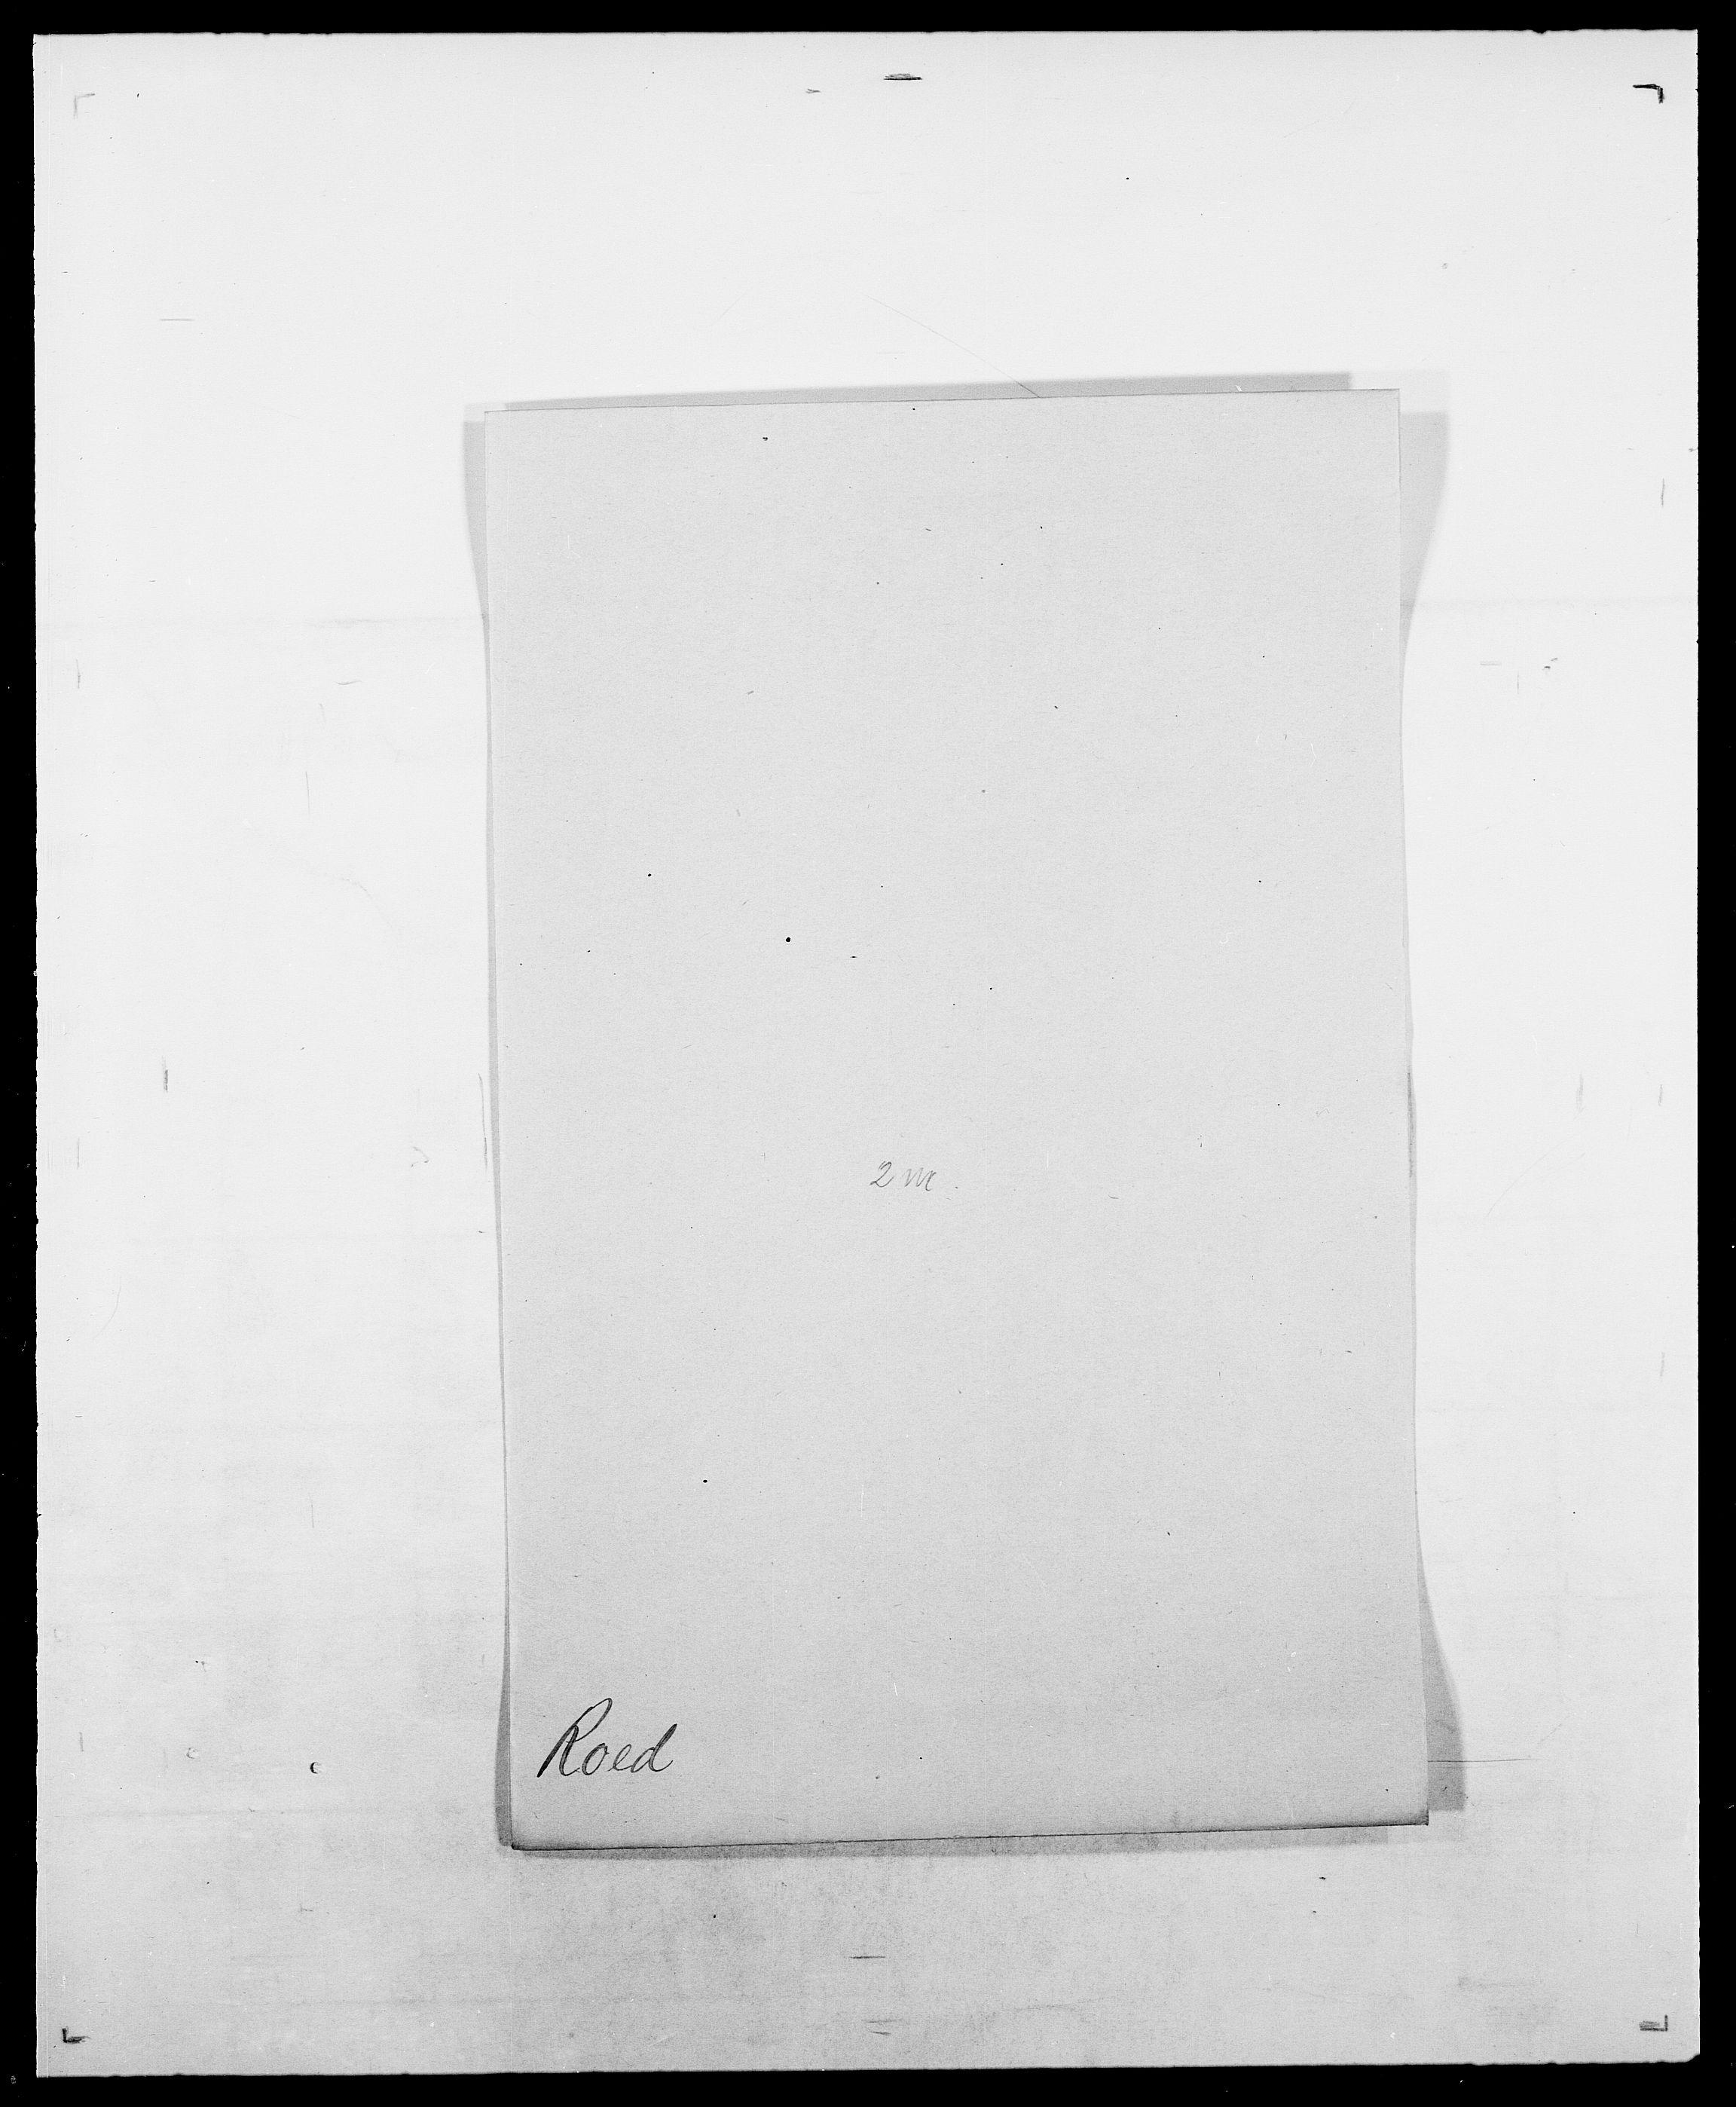 SAO, Delgobe, Charles Antoine - samling, D/Da/L0033: Roald - Røyem, s. 58